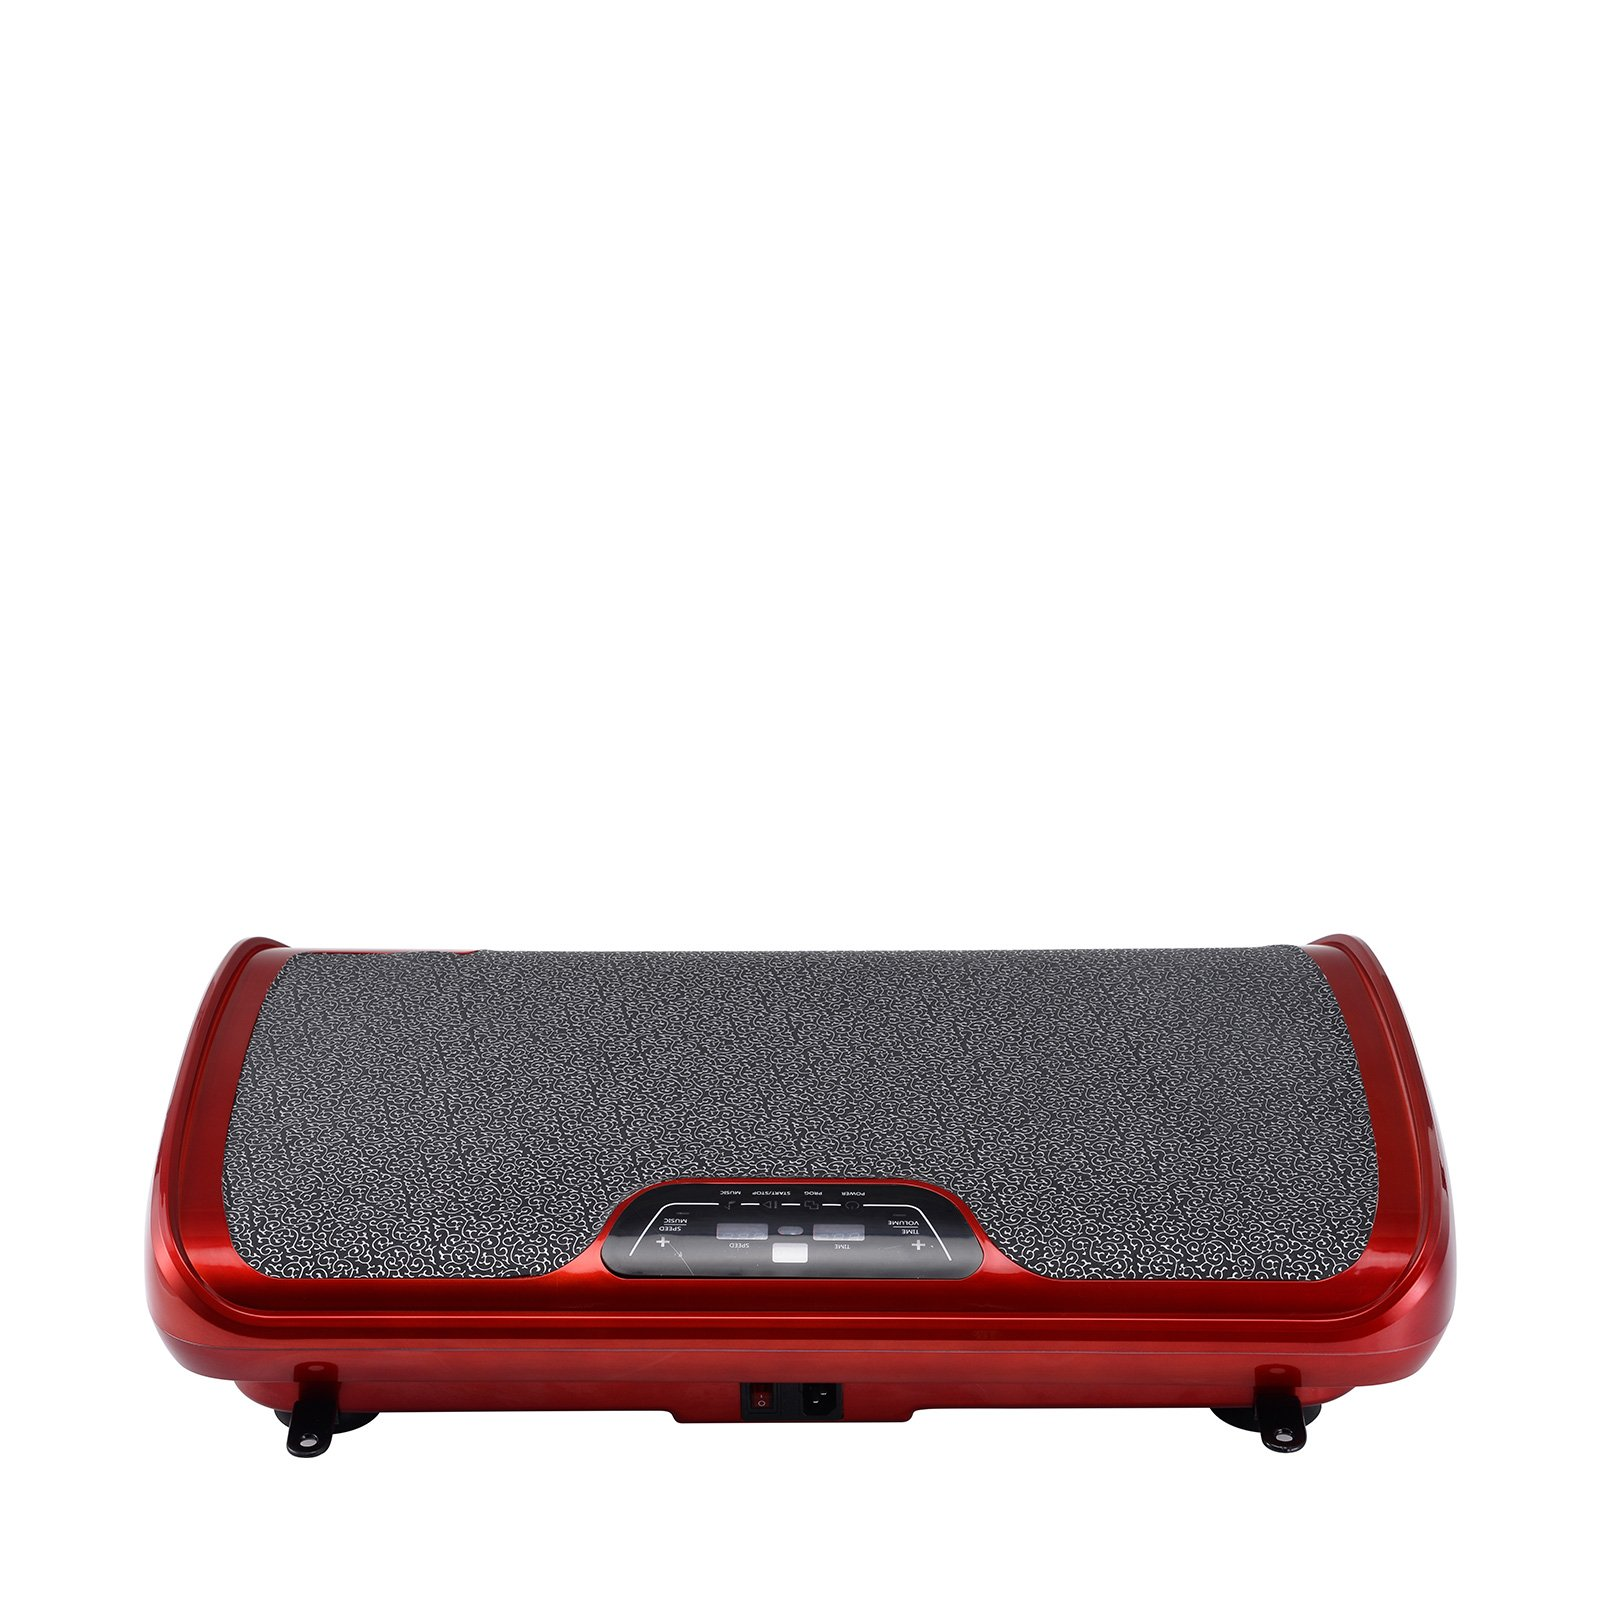 VibroSlim Tone Vibration Platform Fitness Machine, Oscillating Vibration Trainer + Free Workout DVD, Wall Chart & Resistance Bands (Red) by VibroSlim (Image #4)